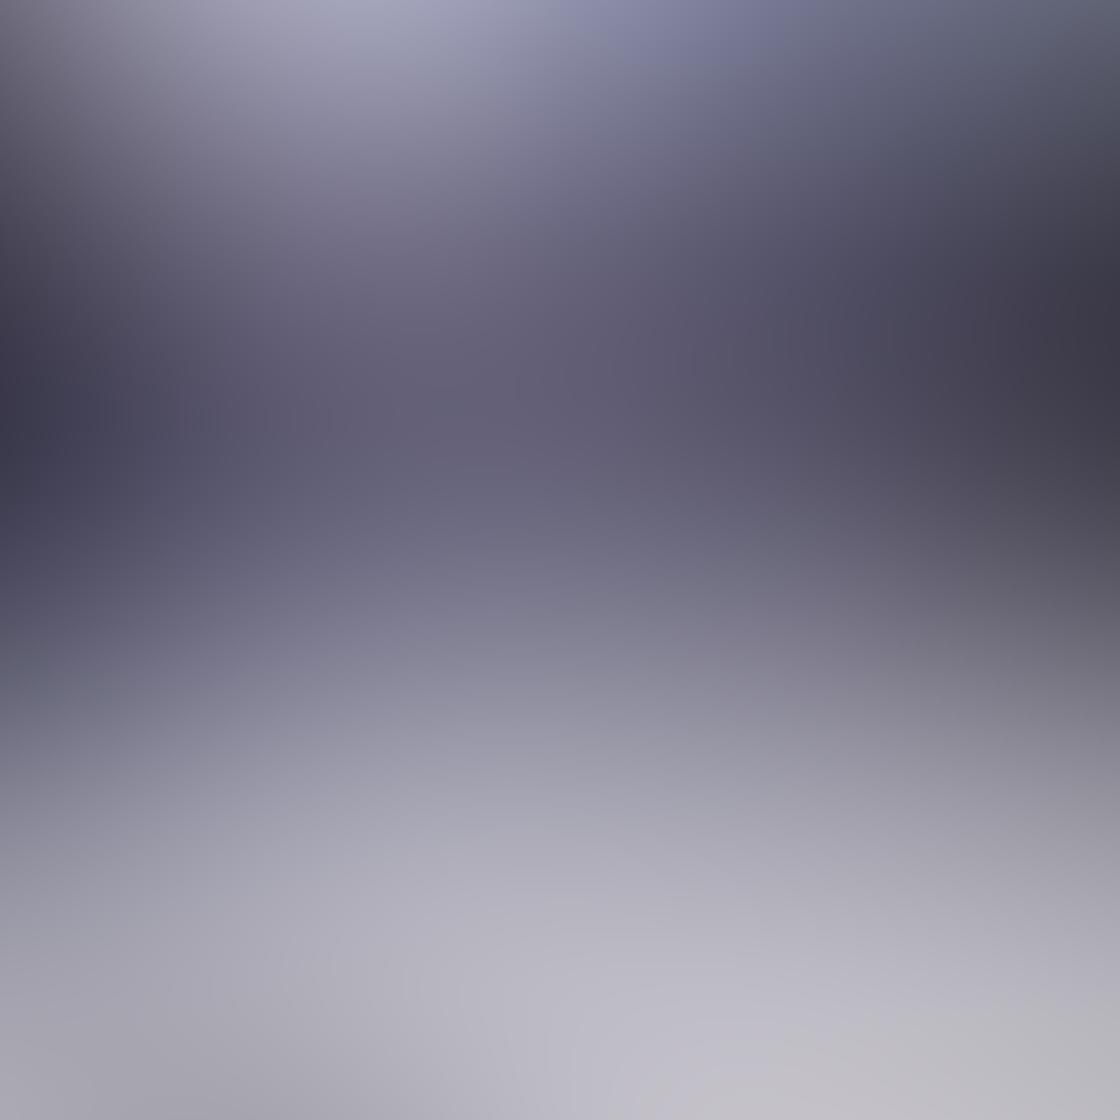 iPhone Weather Photo 18